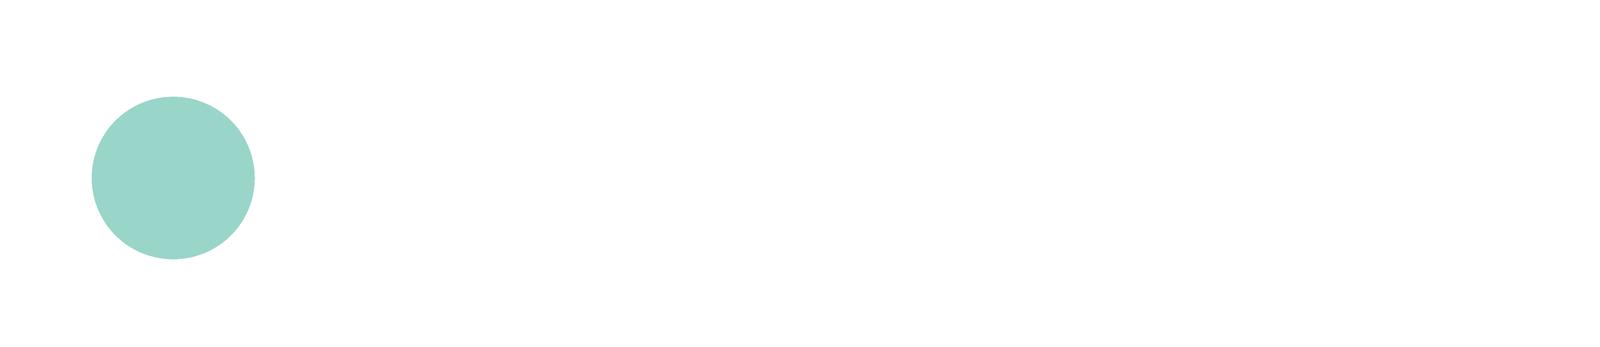 CANVS Street Art Logo